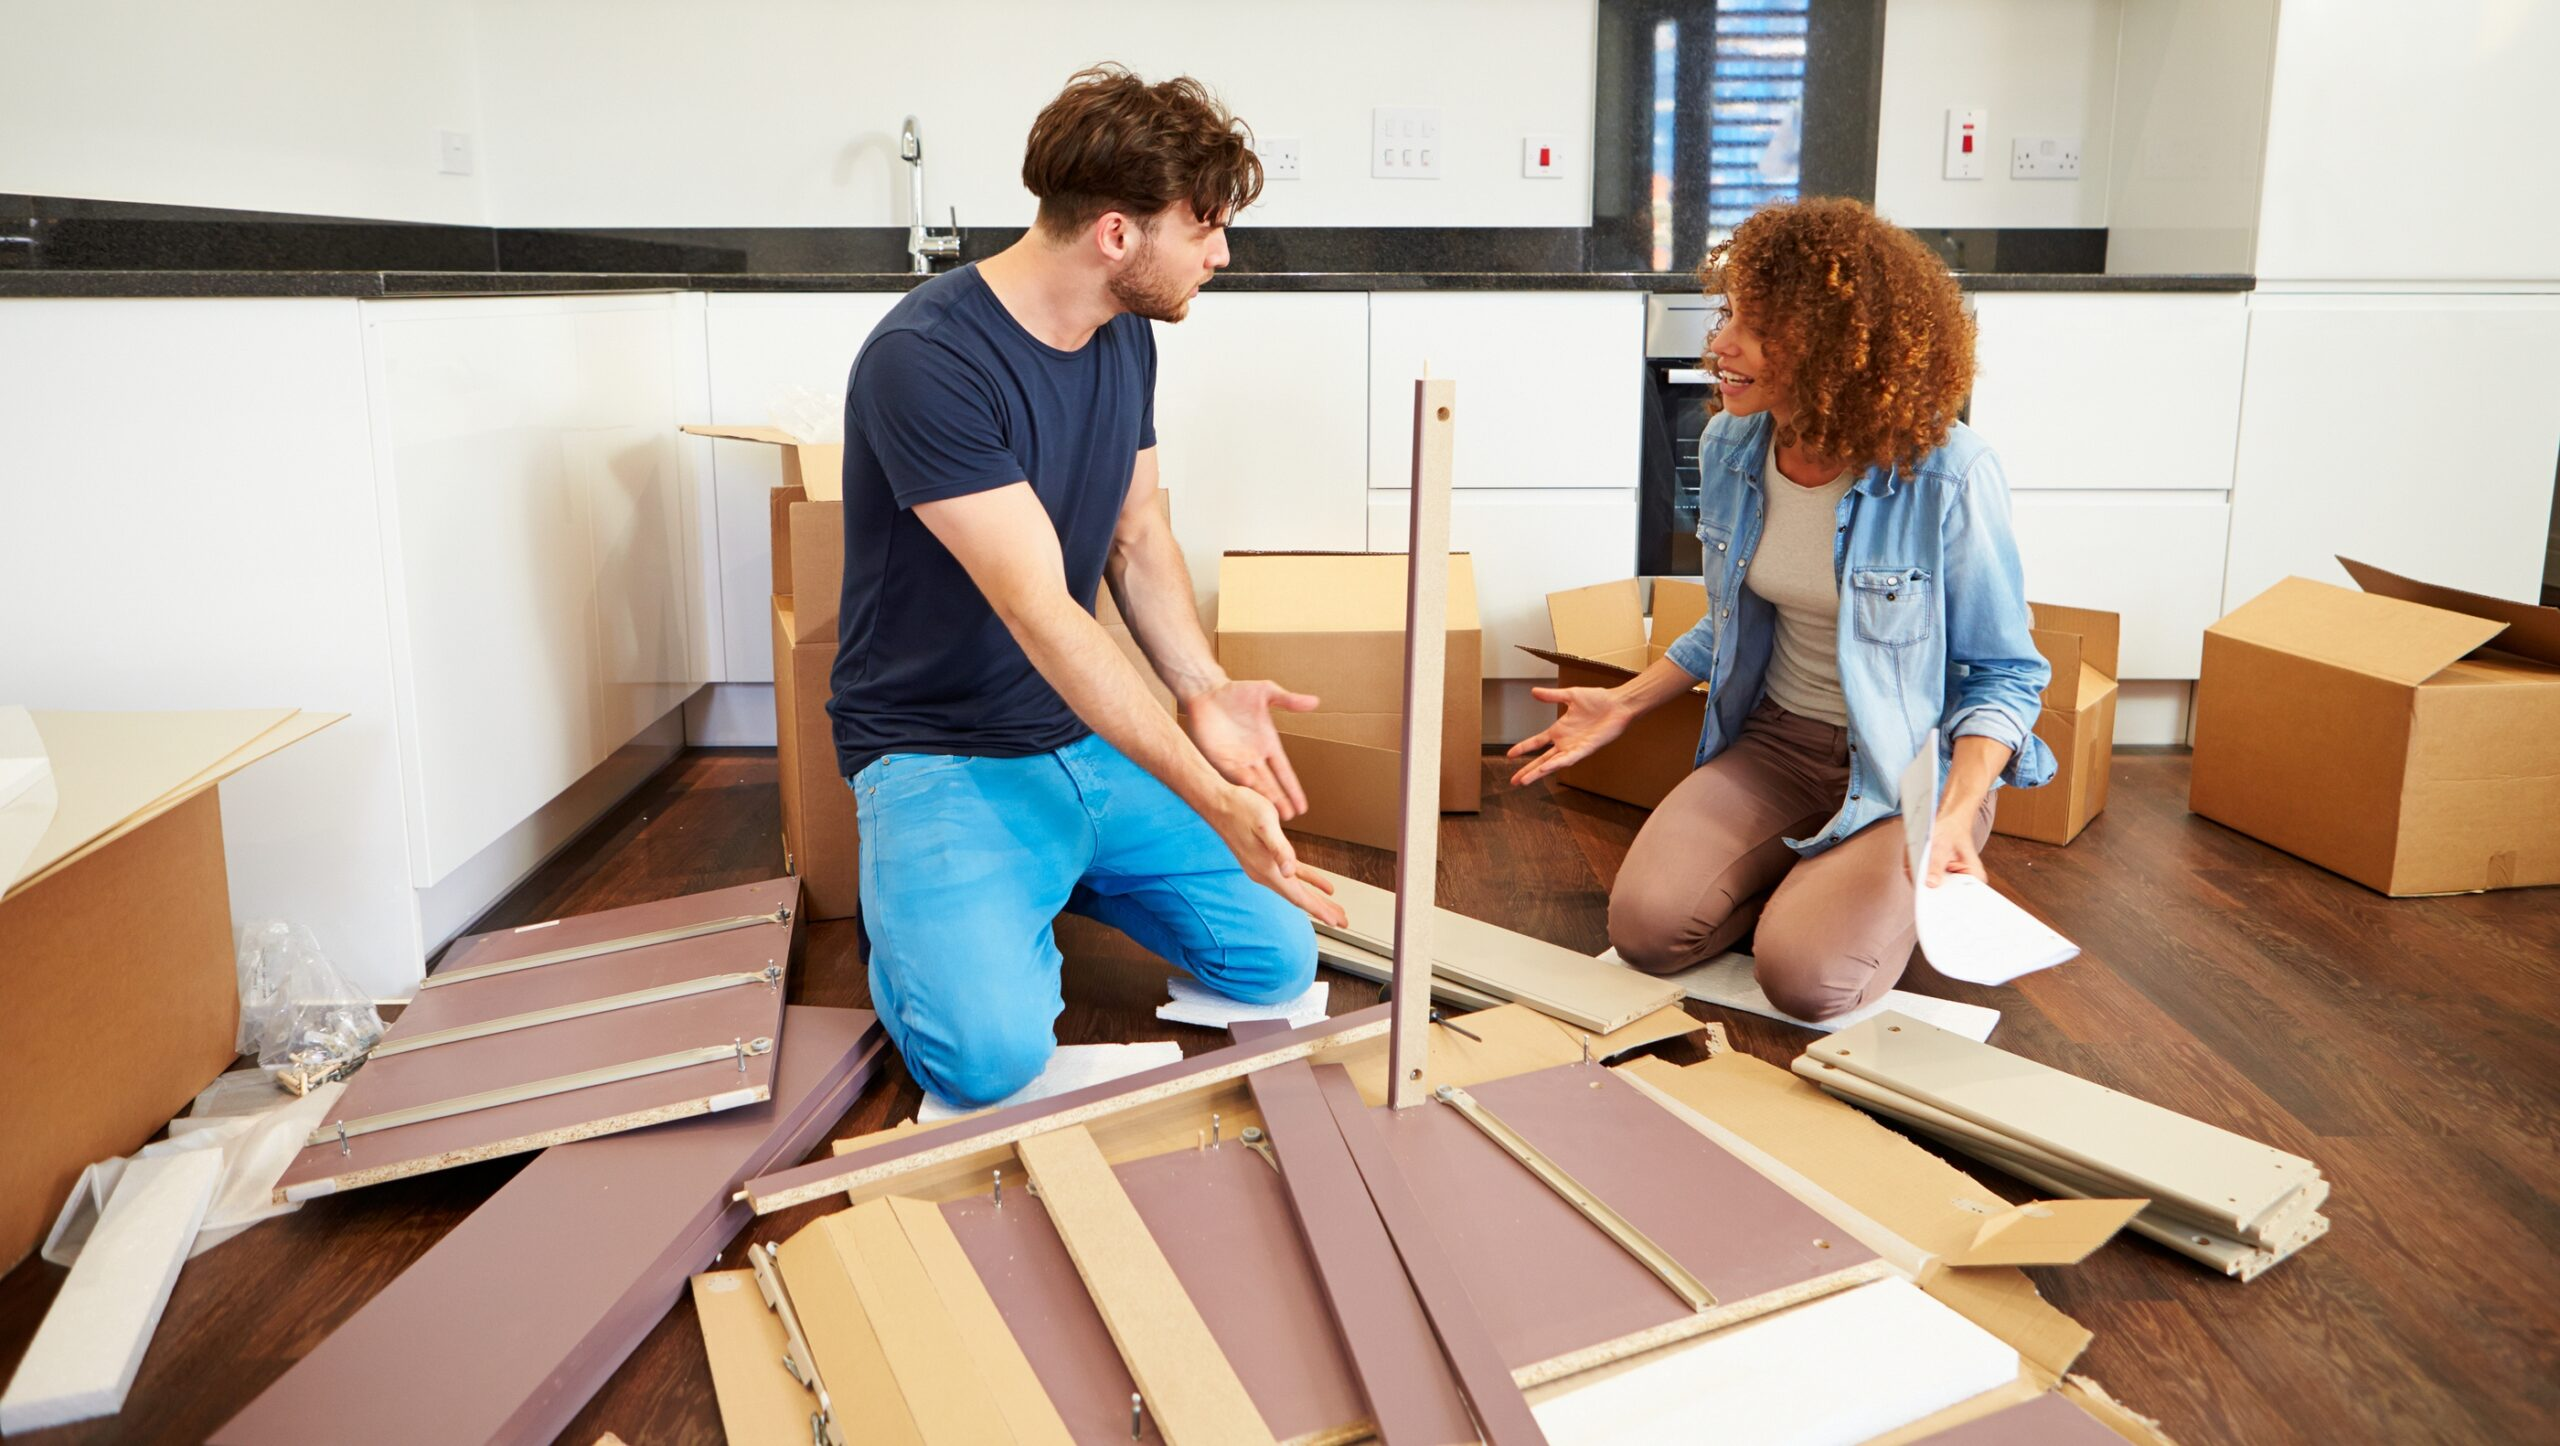 Грузоперевозка мебели со сборкой